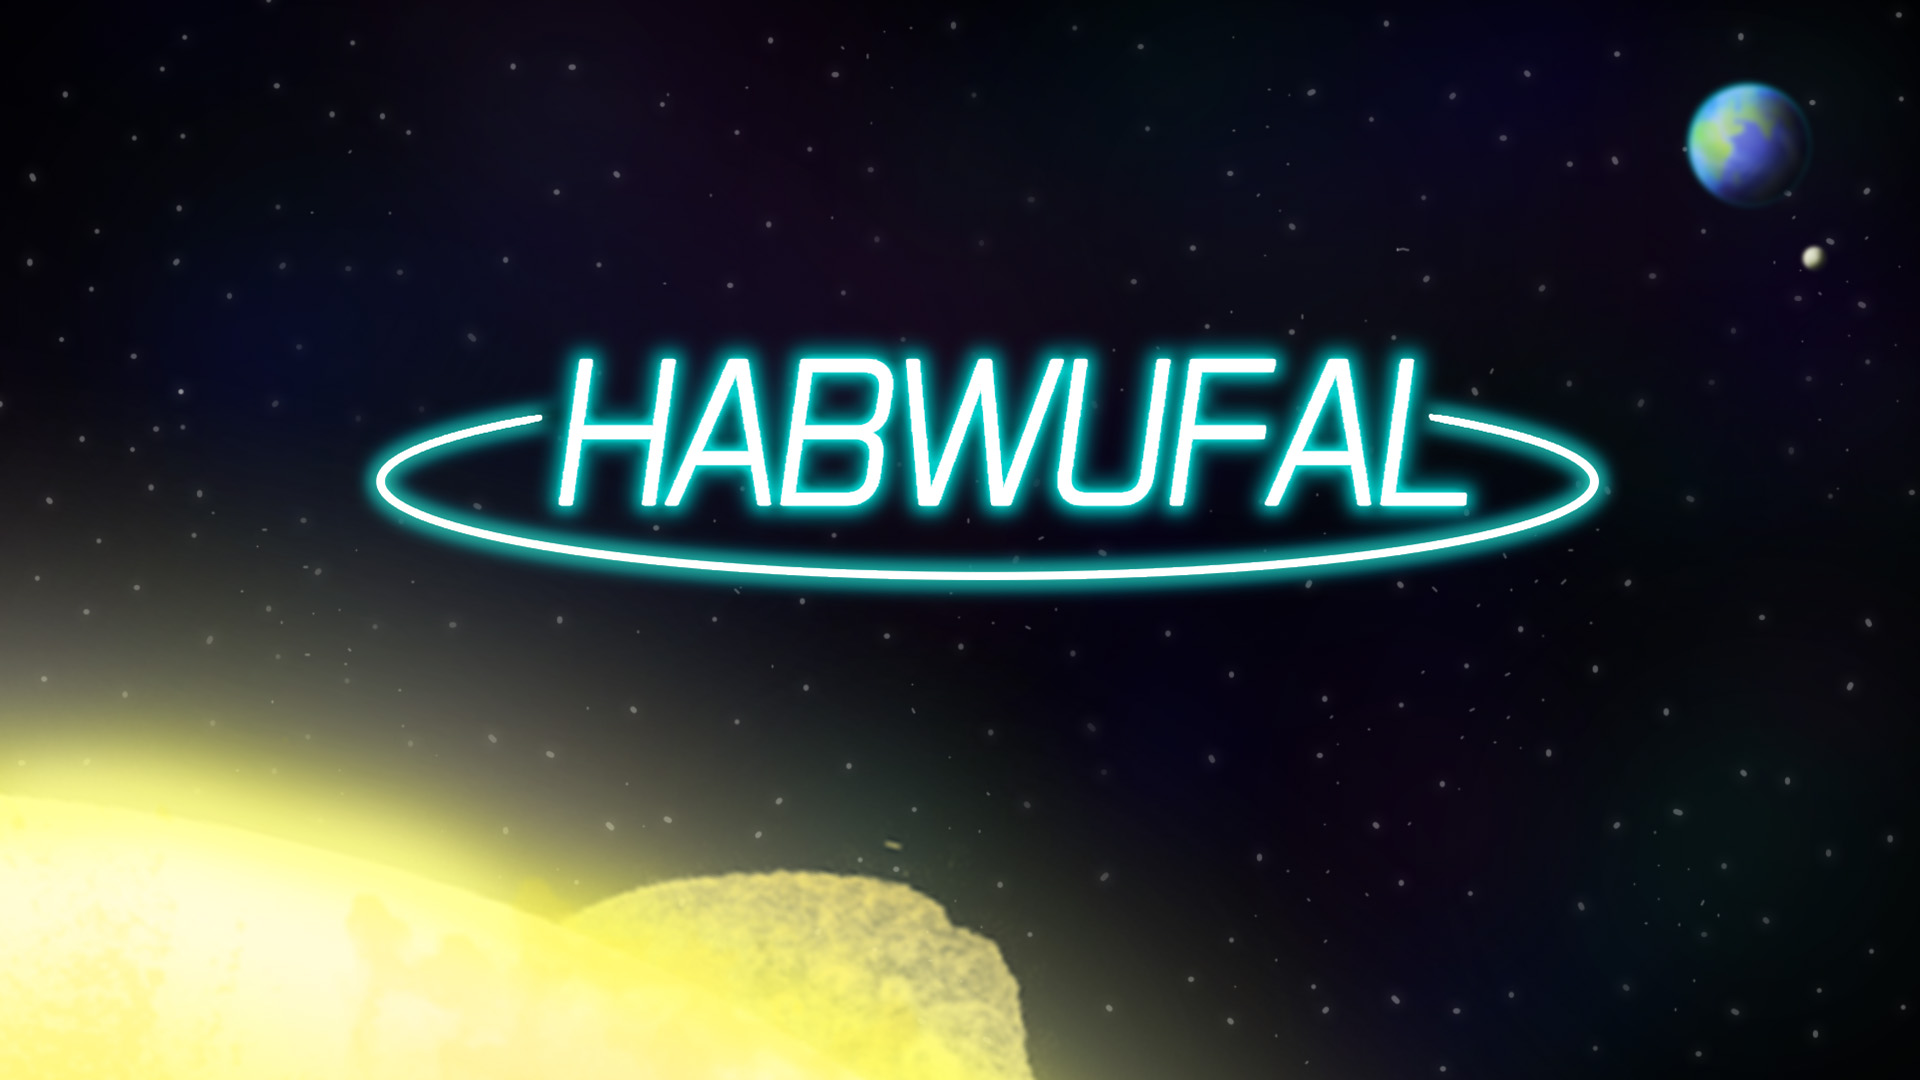 Habwufal